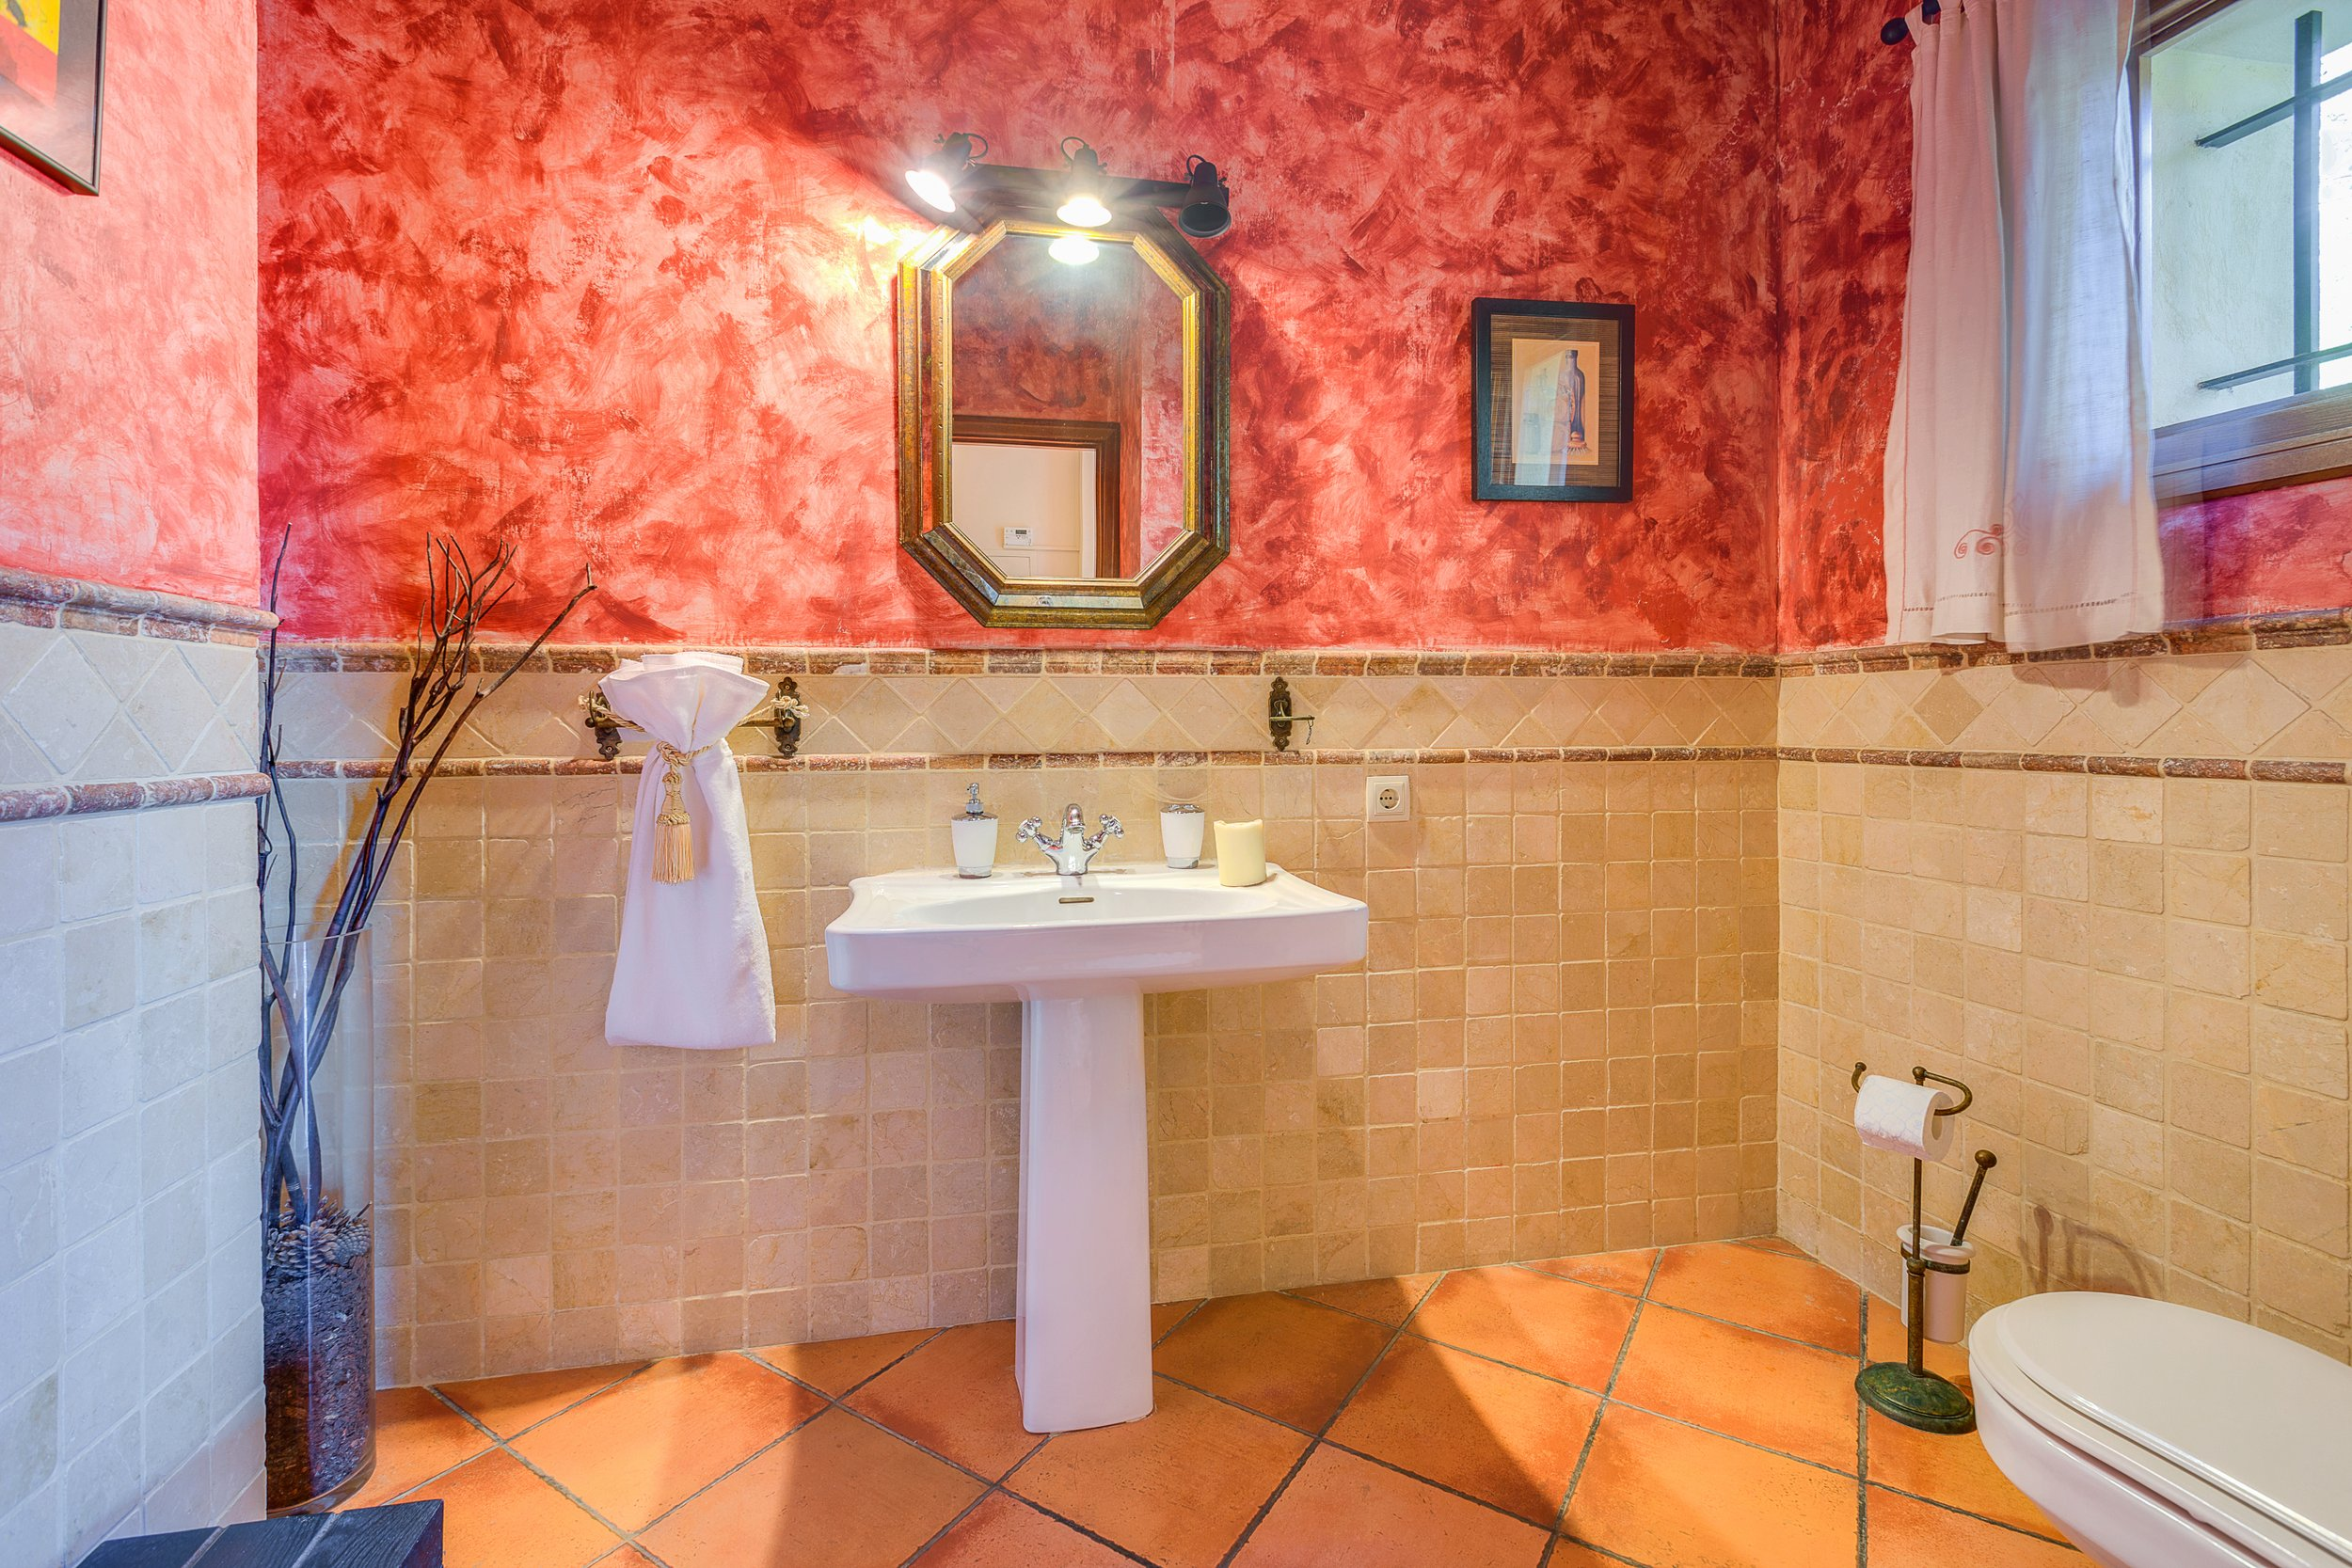 Maison de vacances Villa Cirera in Alaro (2611793), Alaro, Majorque, Iles Baléares, Espagne, image 25